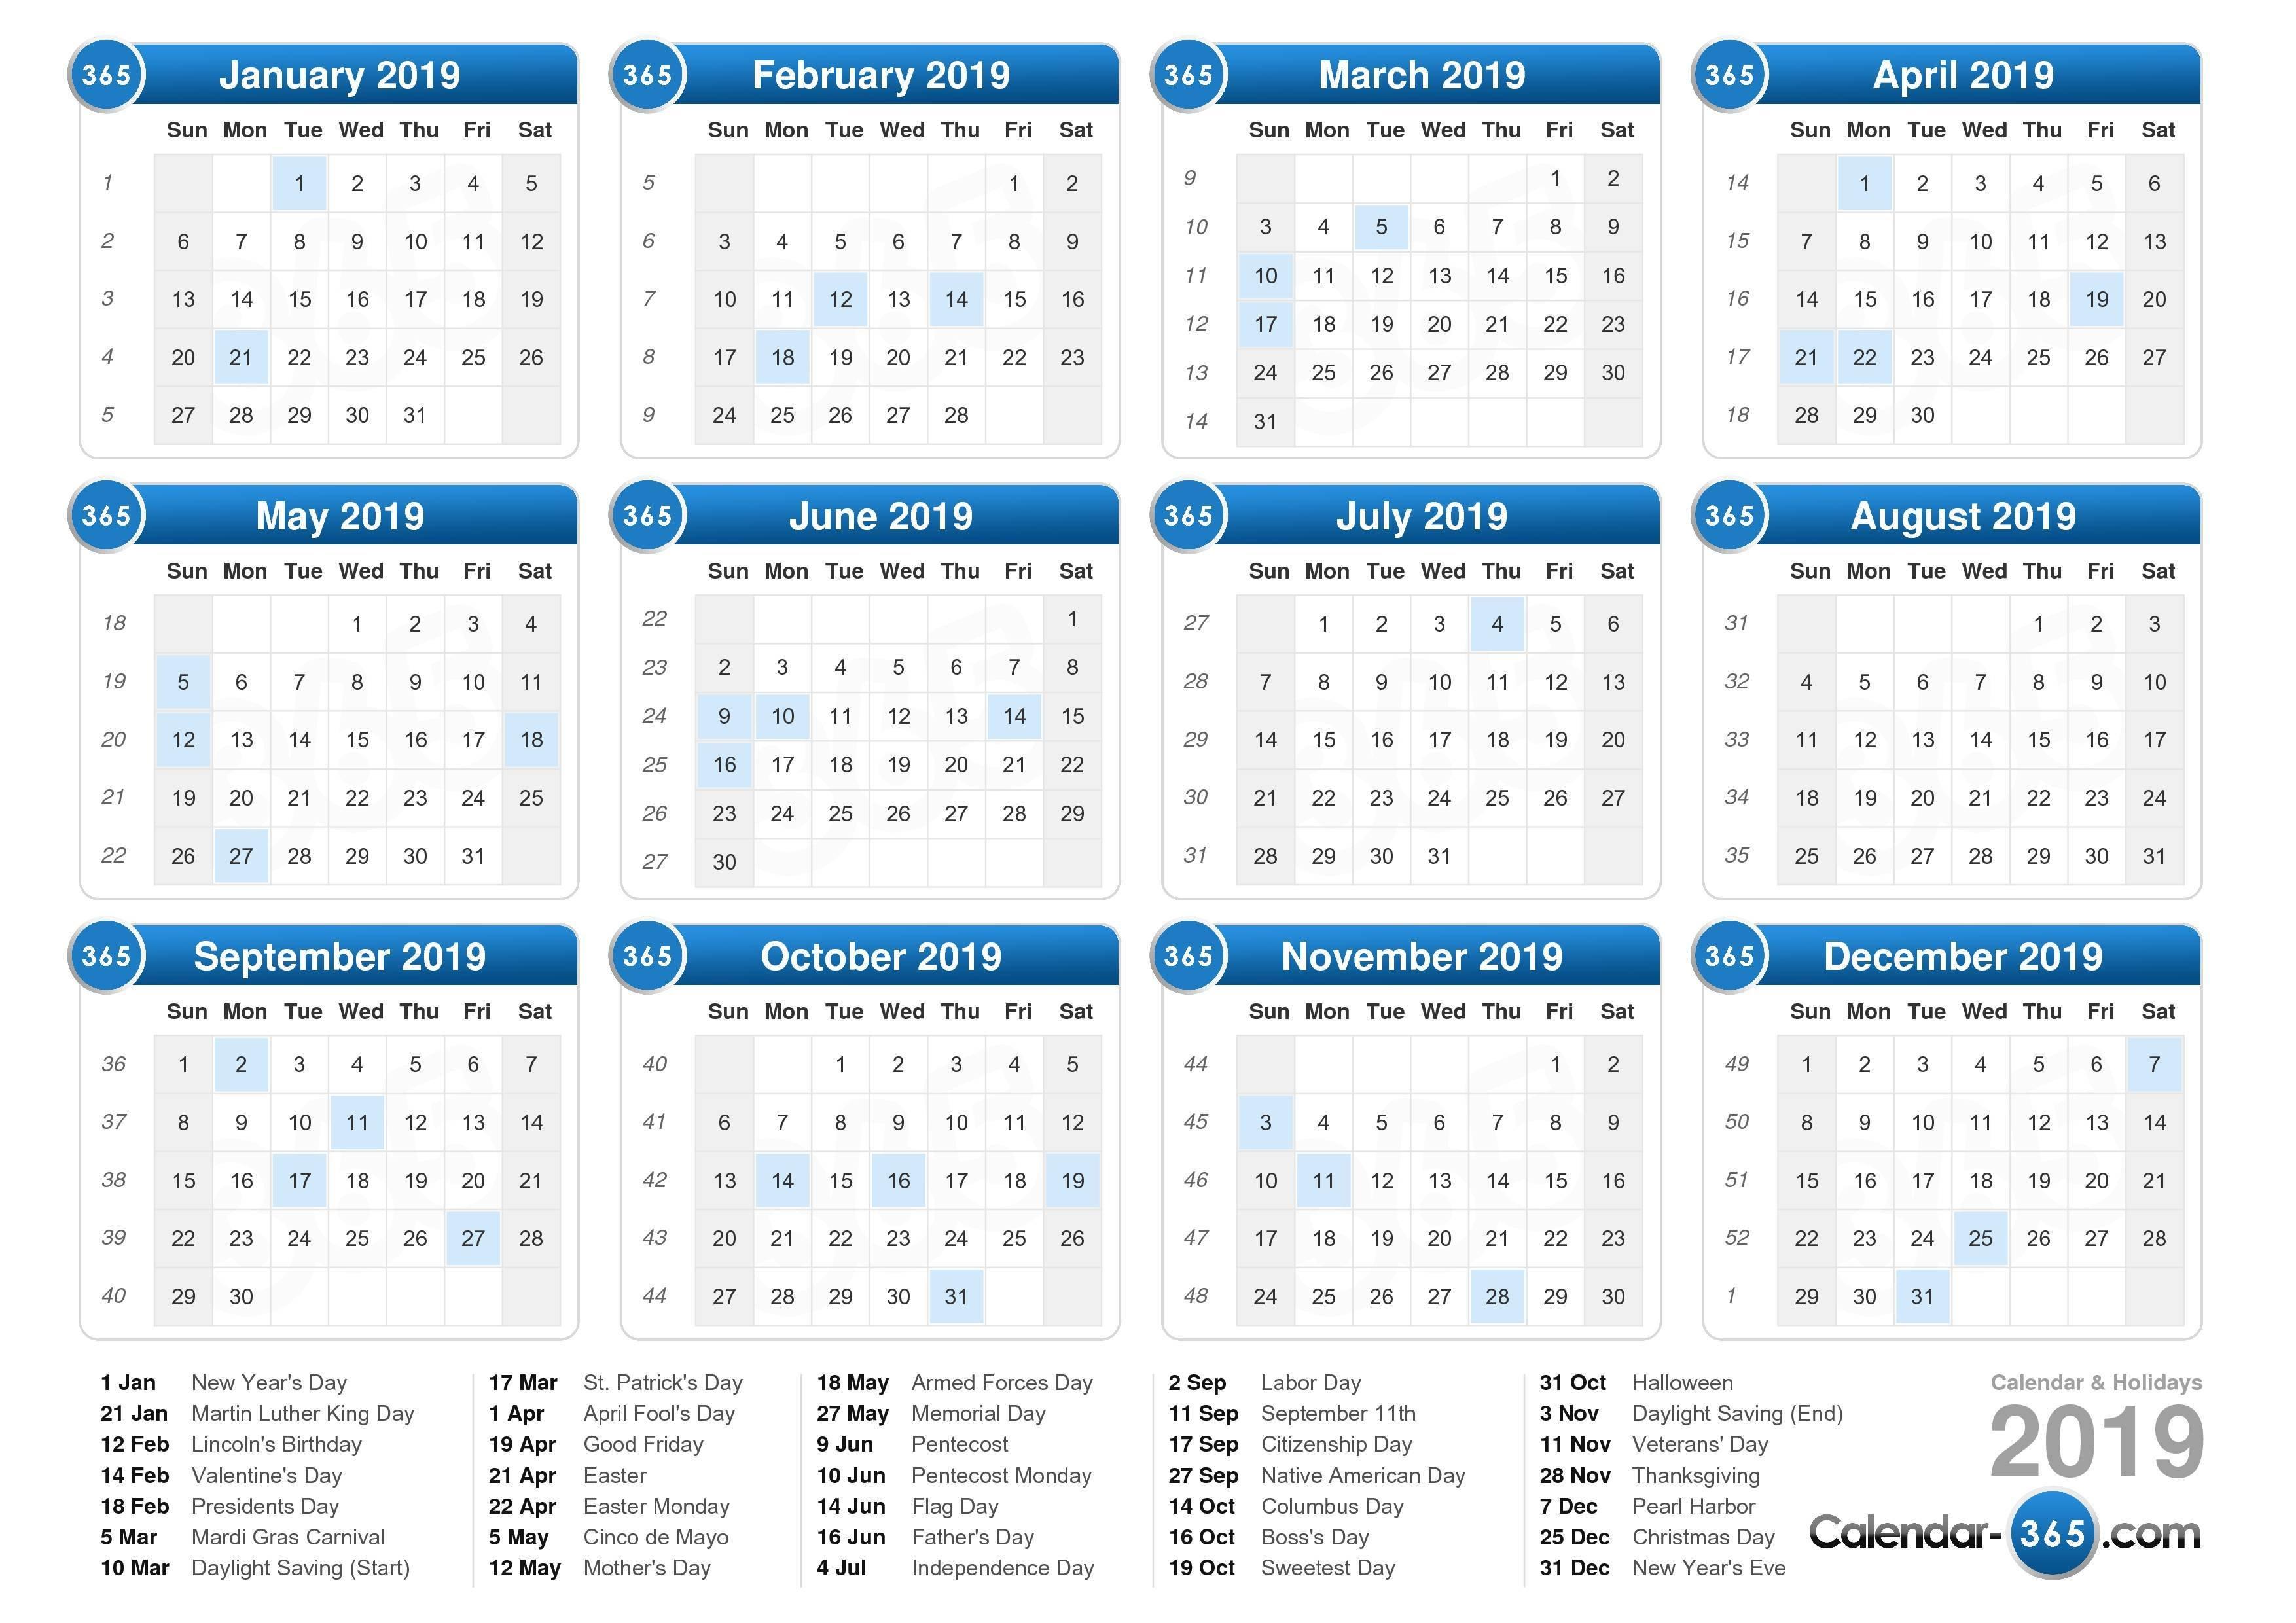 2019 Calendar Calendar 2019 Numbered Weeks